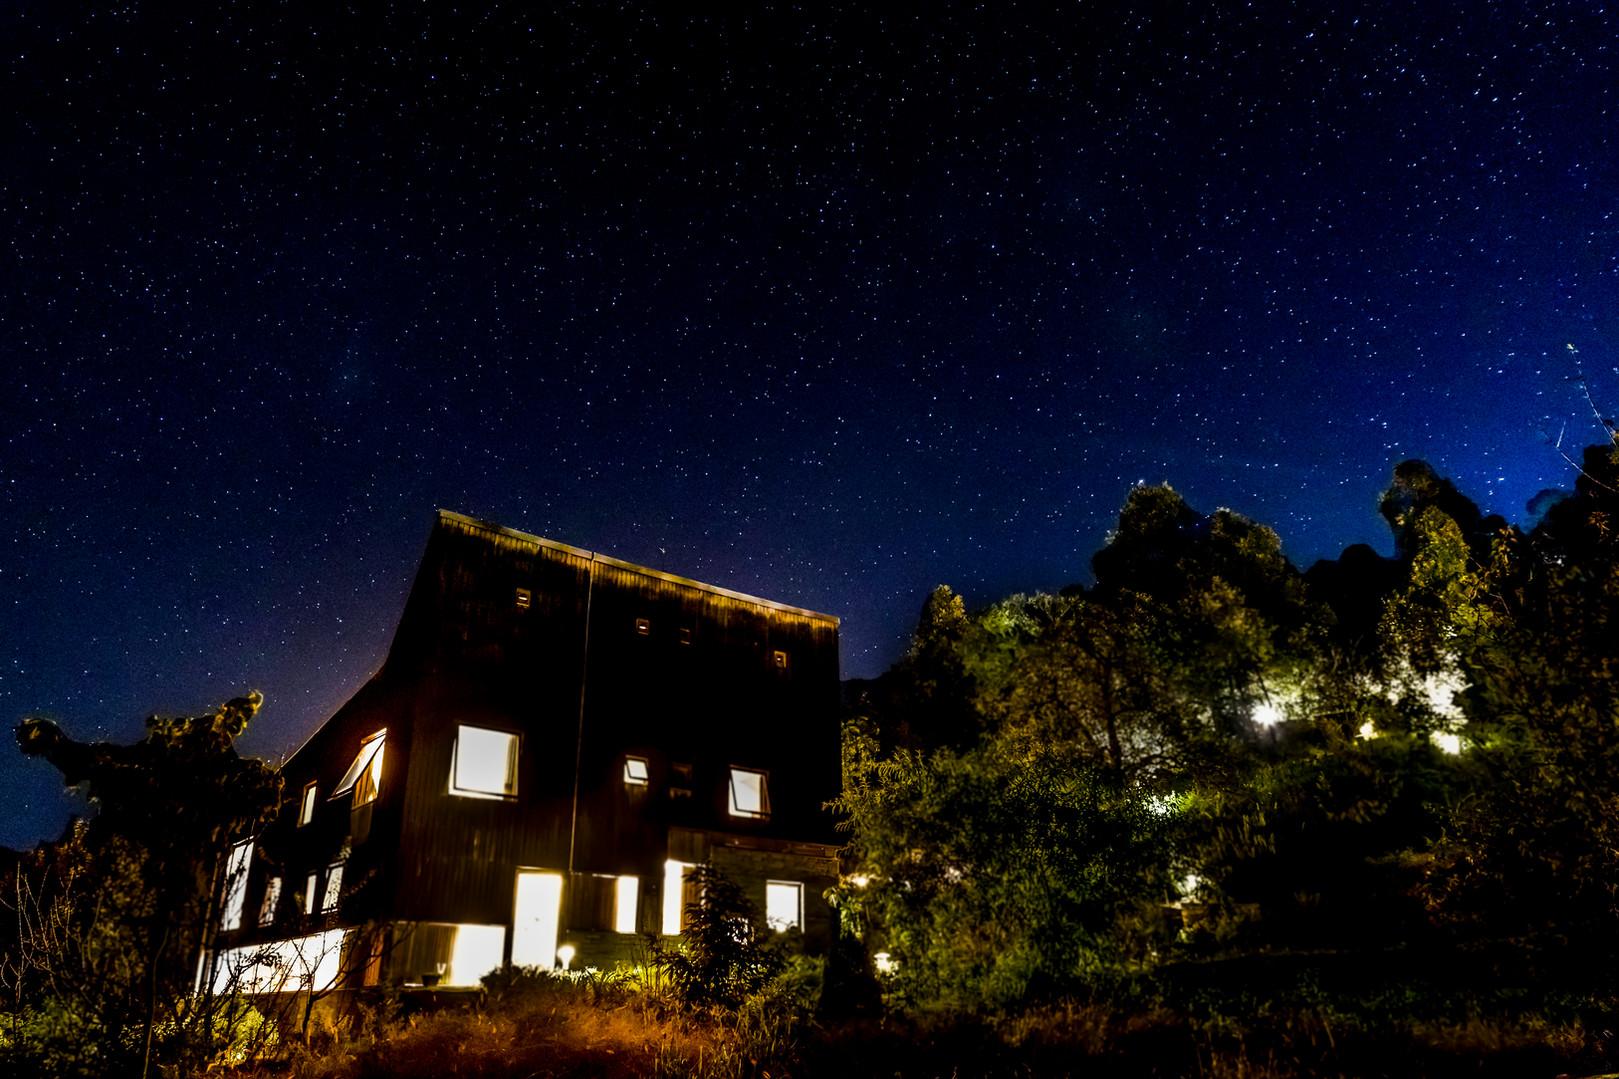 Stargaze the night away